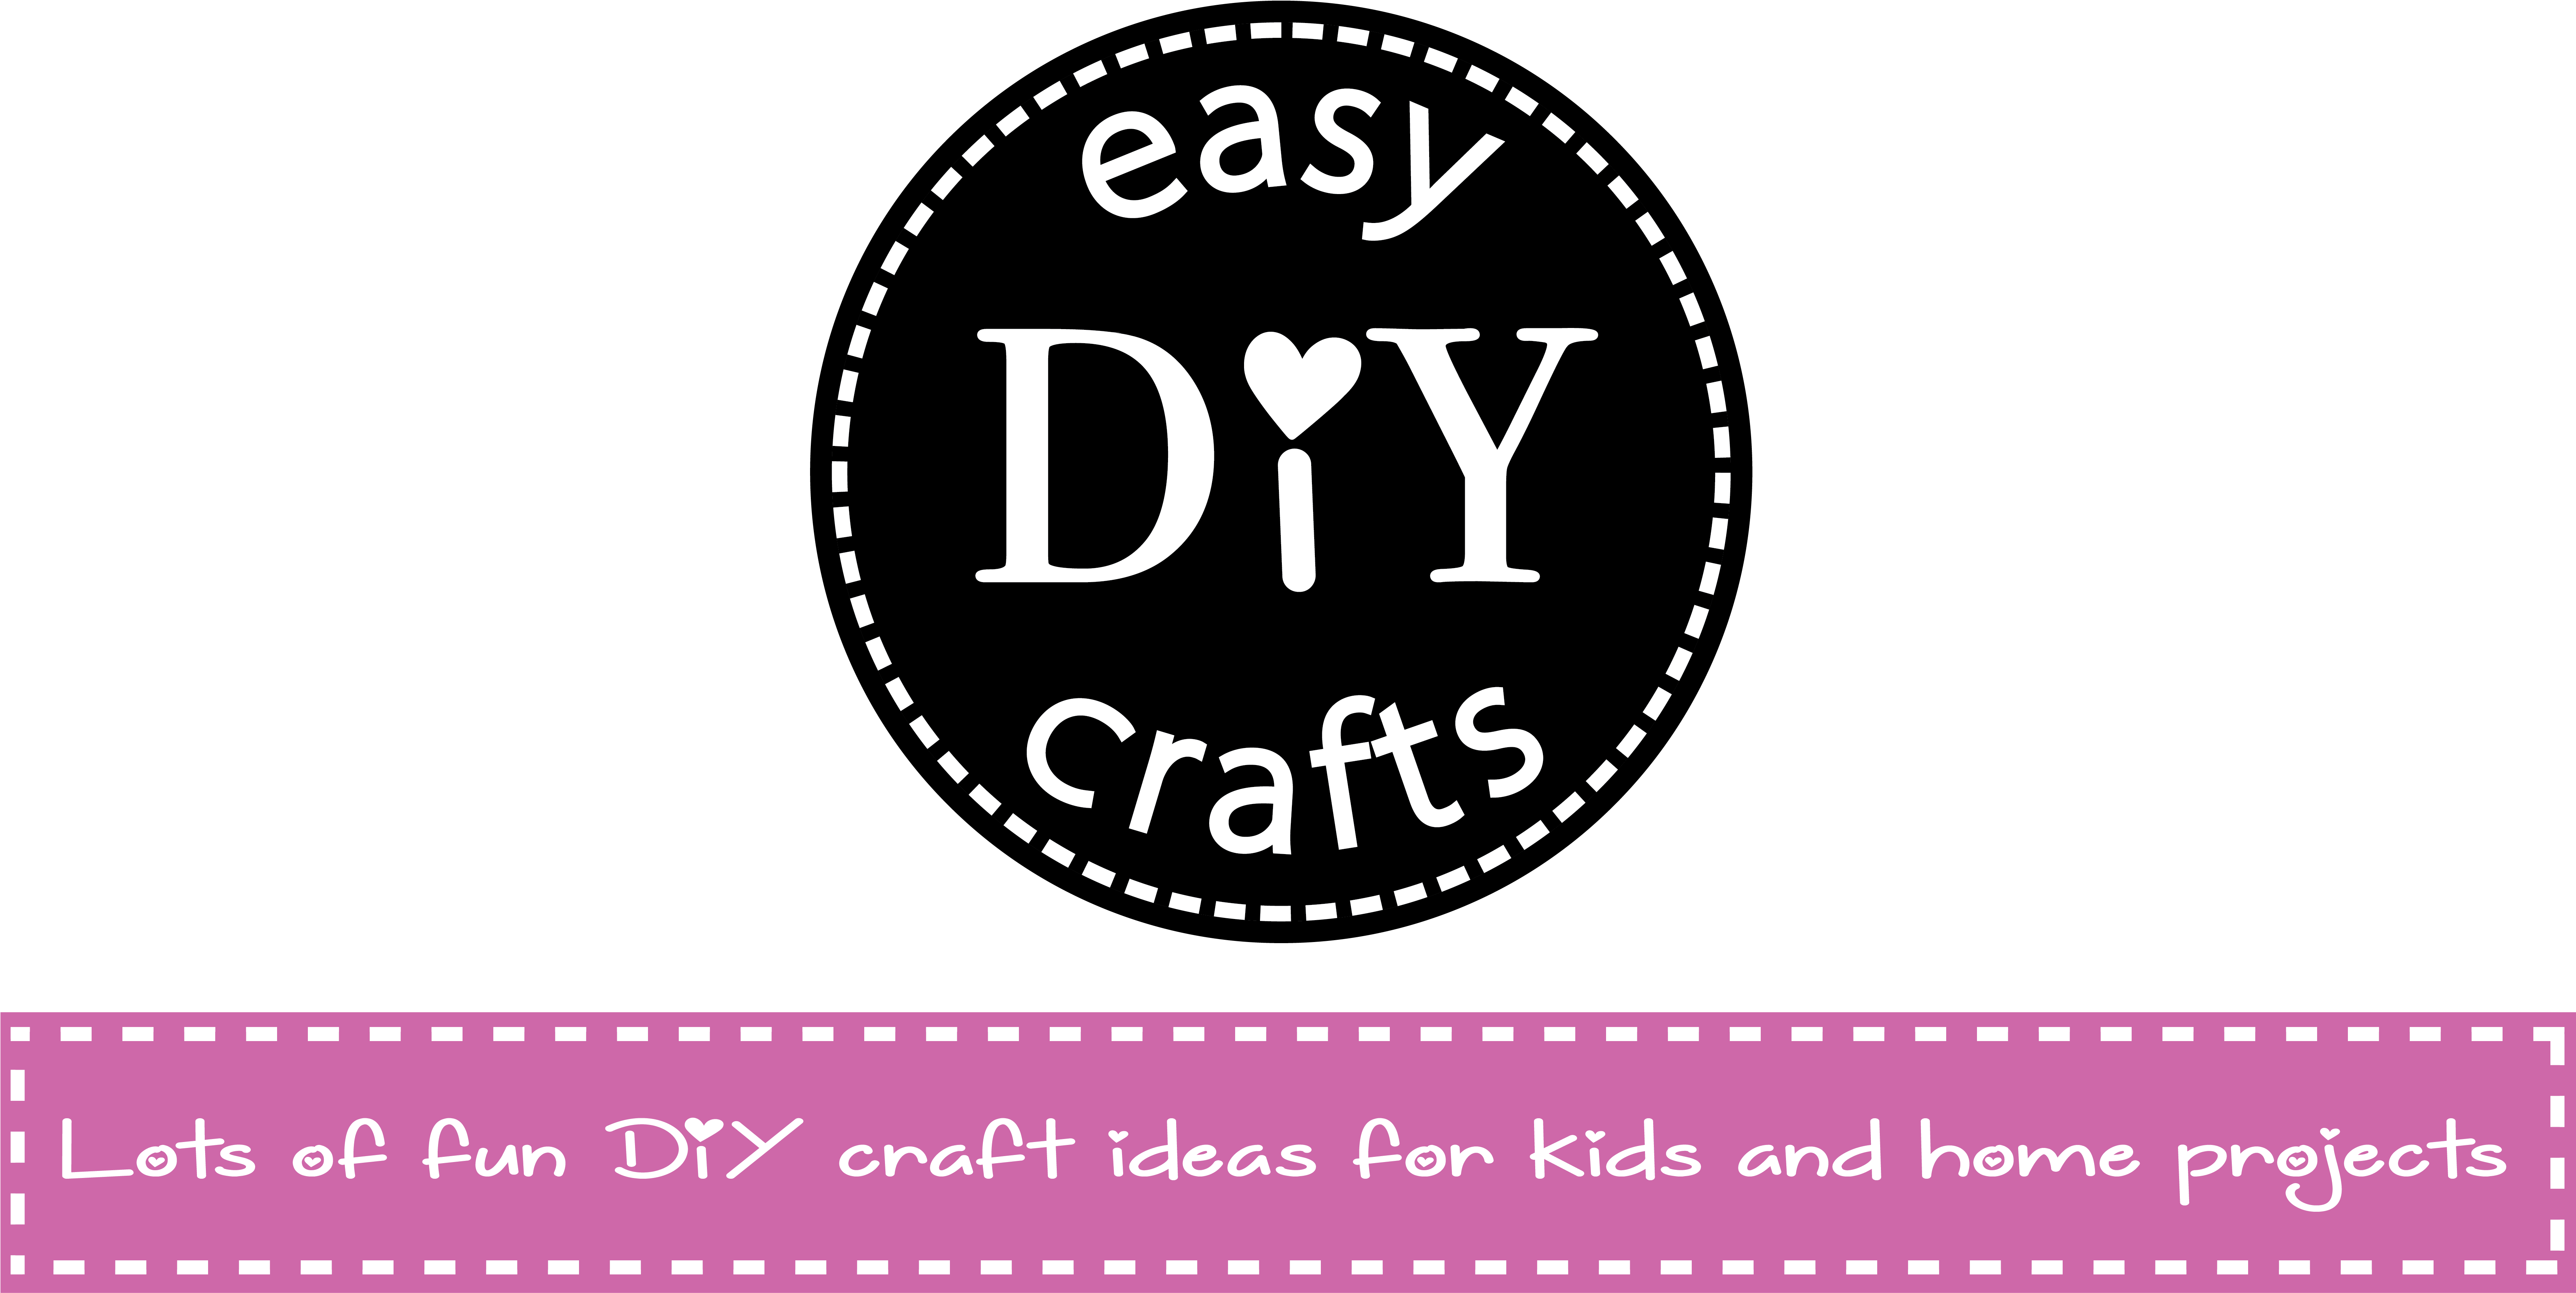 Download Easy Diy Crafts Lots Of Fun Diy Craft Ideas For Kids